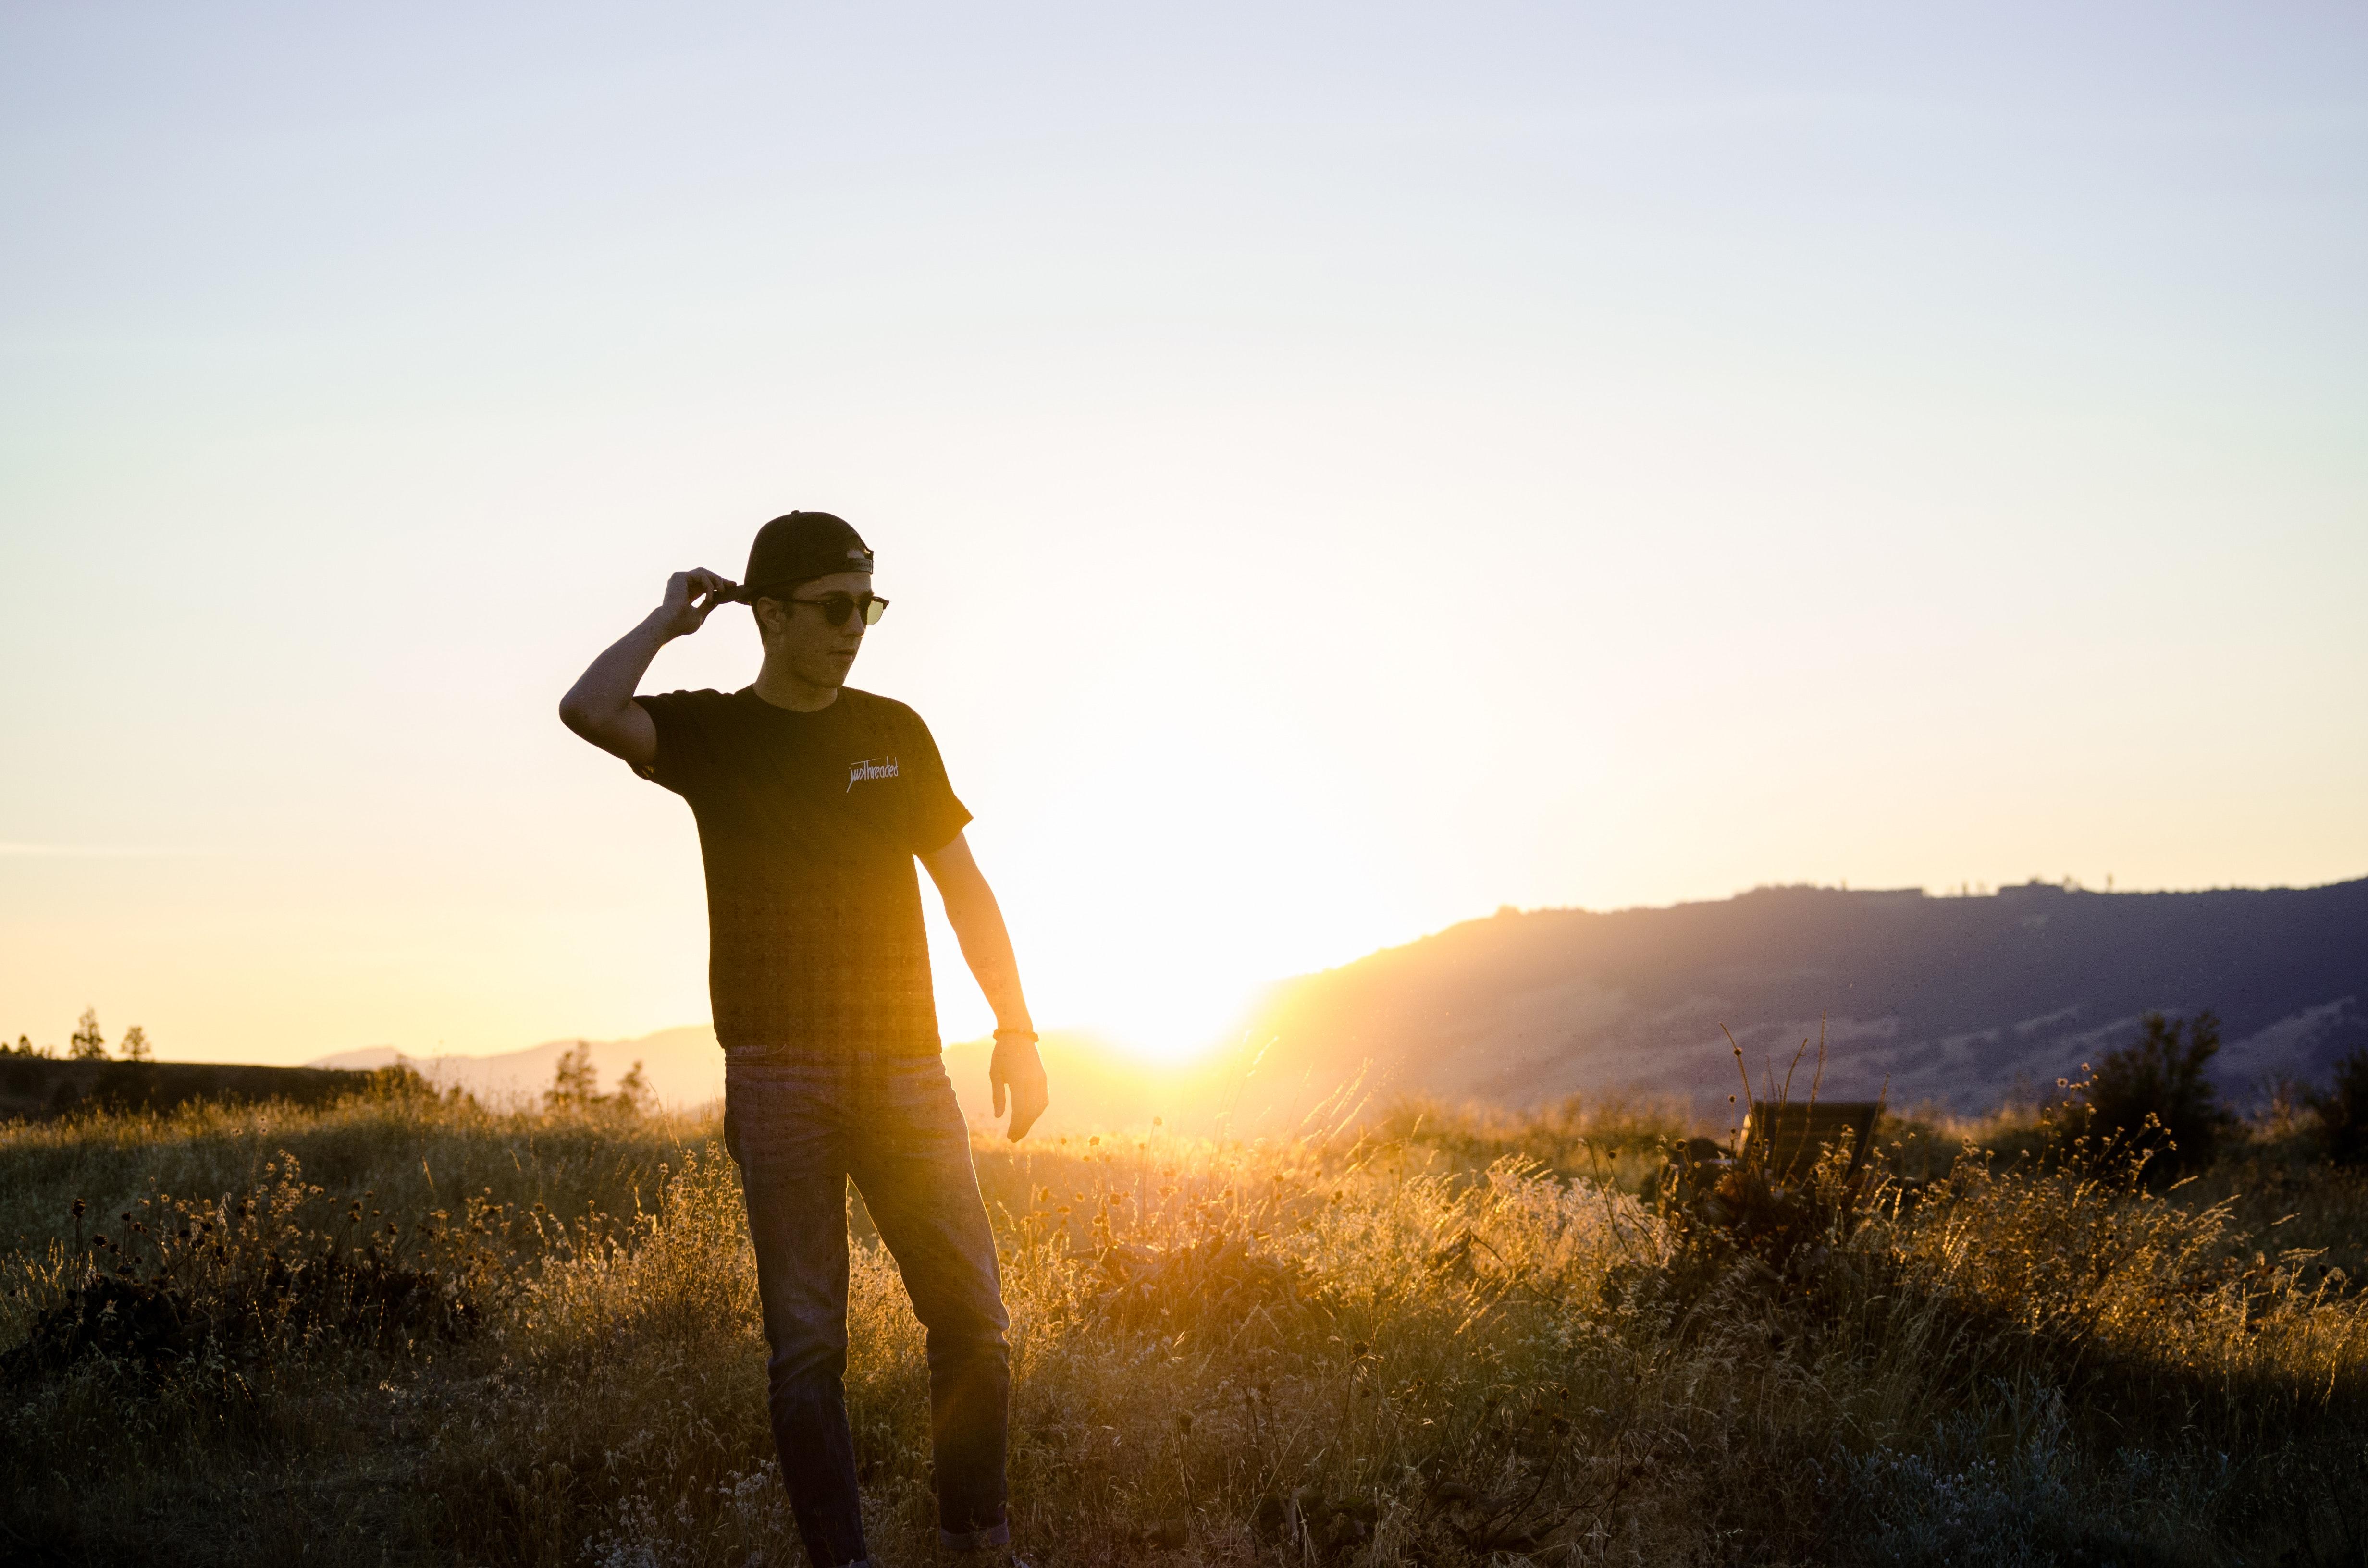 Sunrise Adams Anal